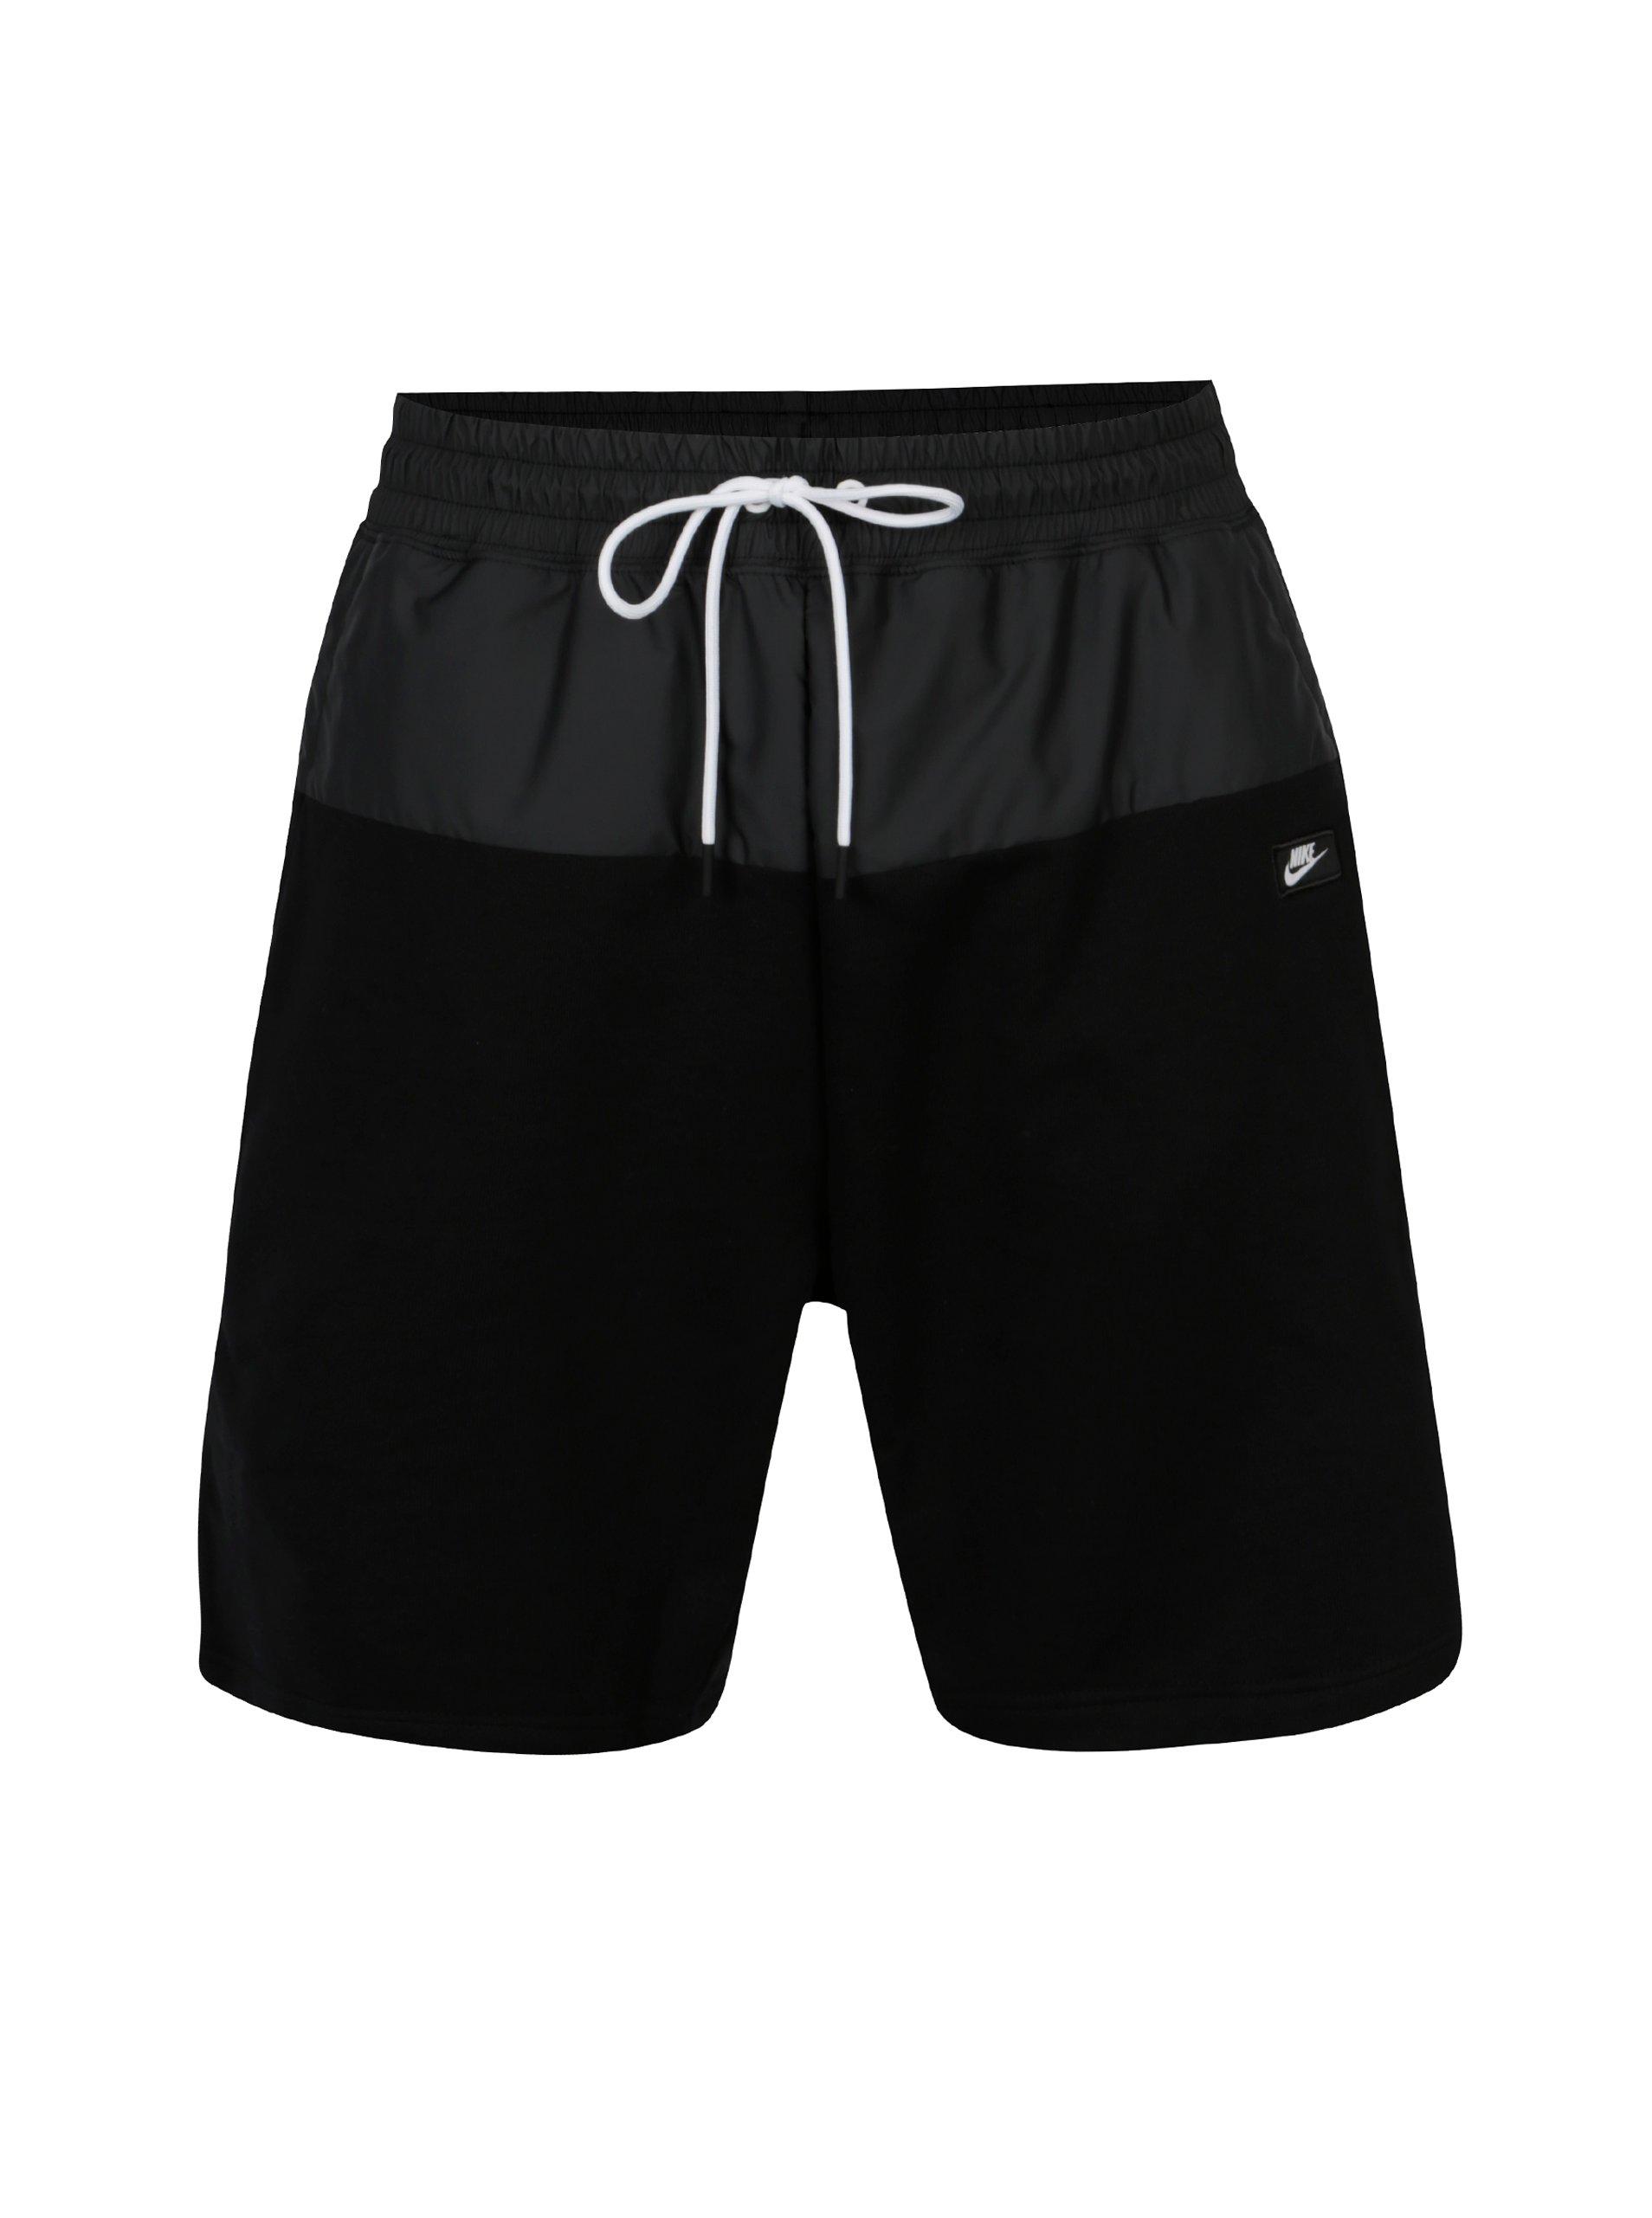 Černé pánské kraťasy s pružným pasem Nike